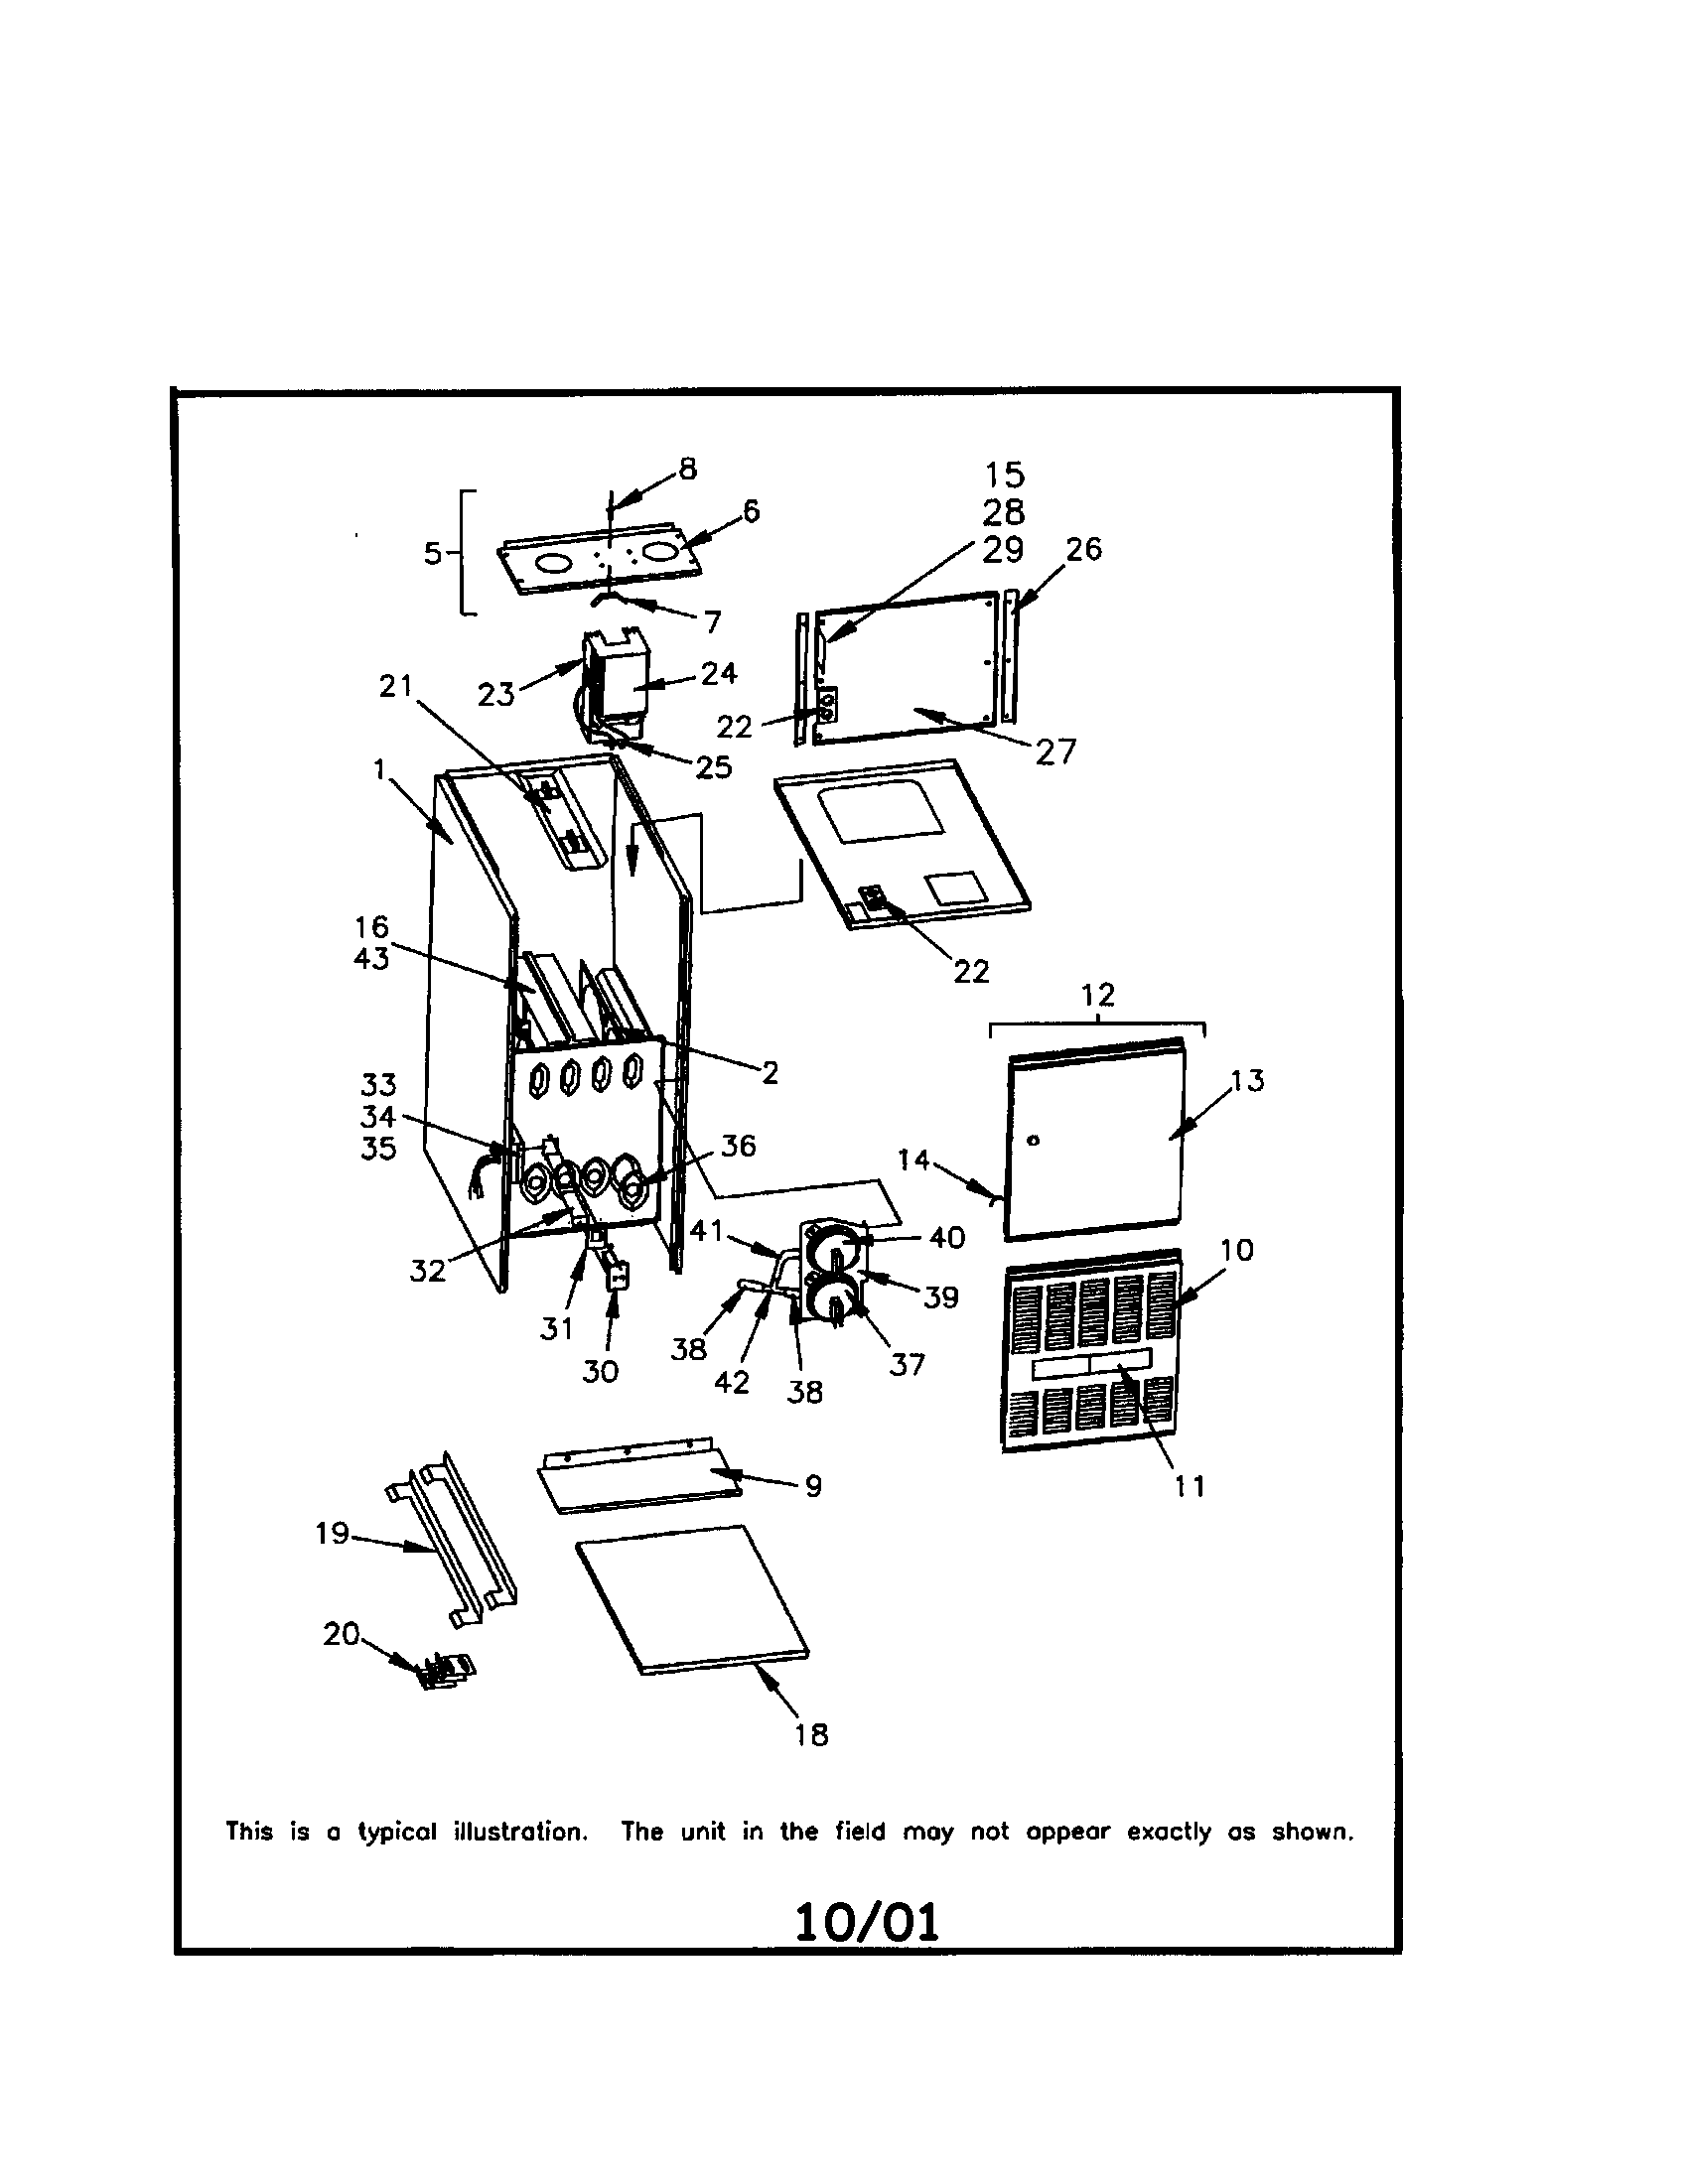 motor schematic diagram motor repalcement parts and diagram